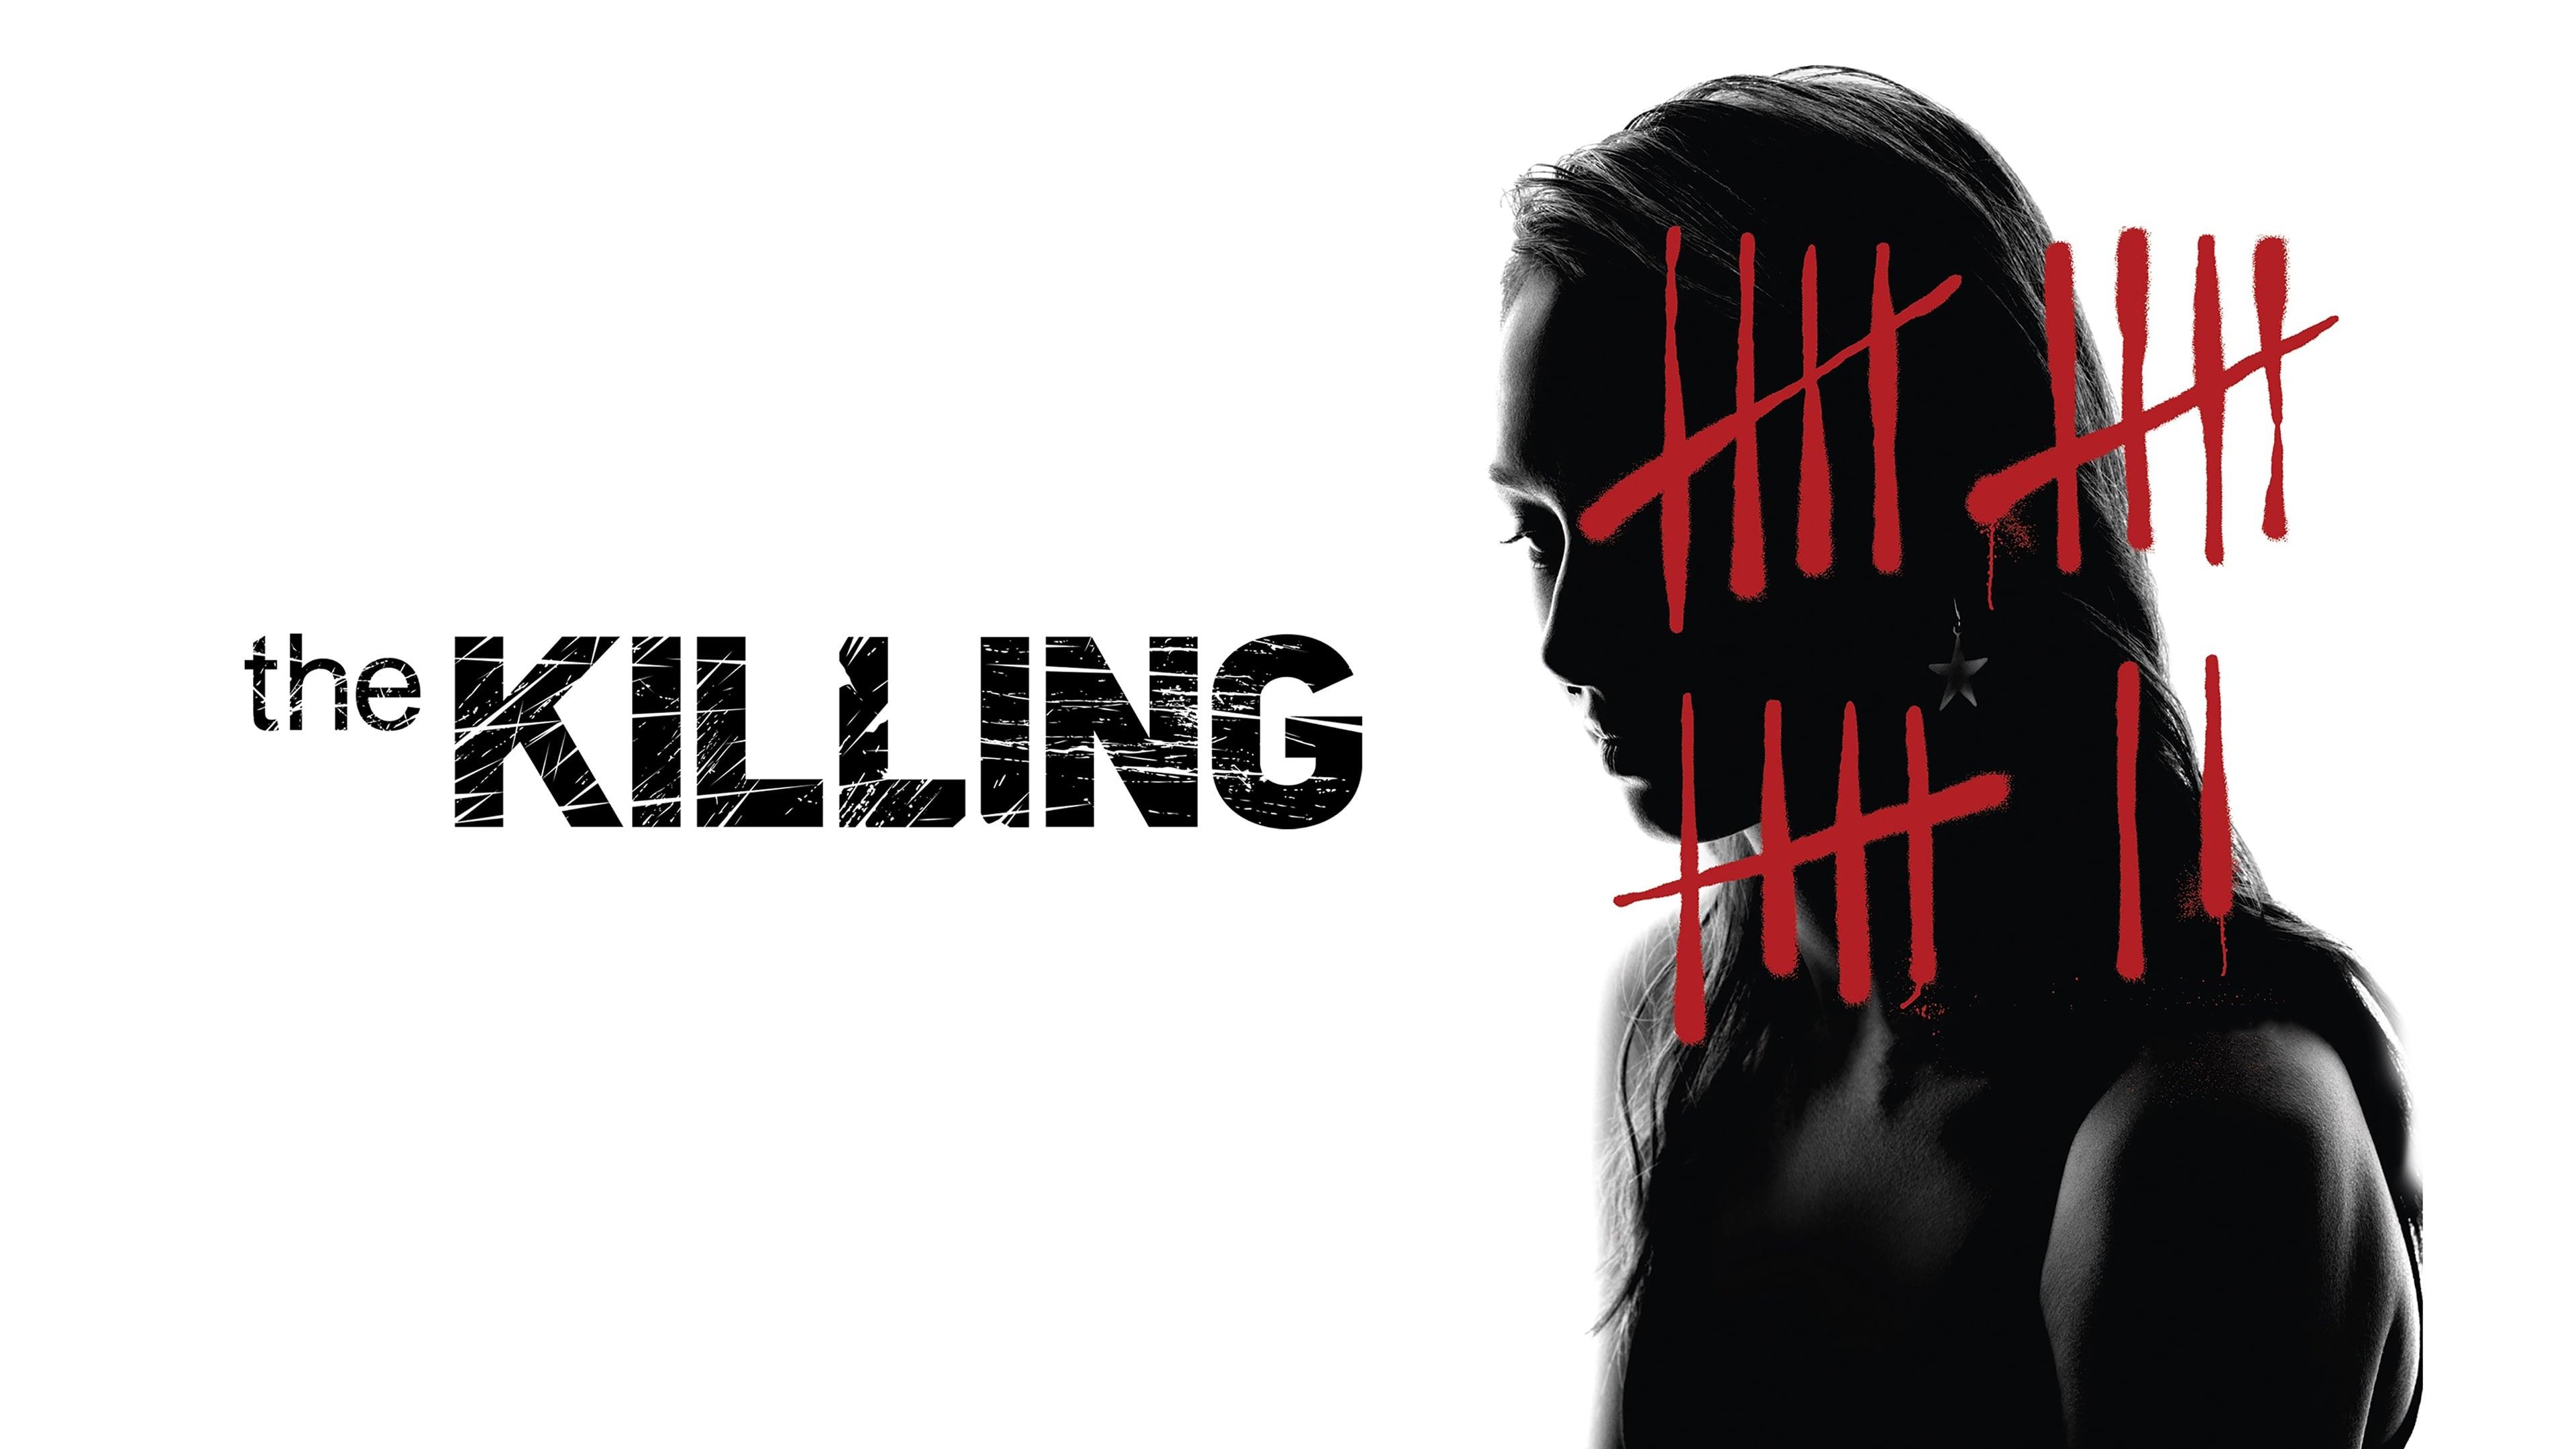 谋杀 第三季 The Killing Season 3 (2013) 中文字幕